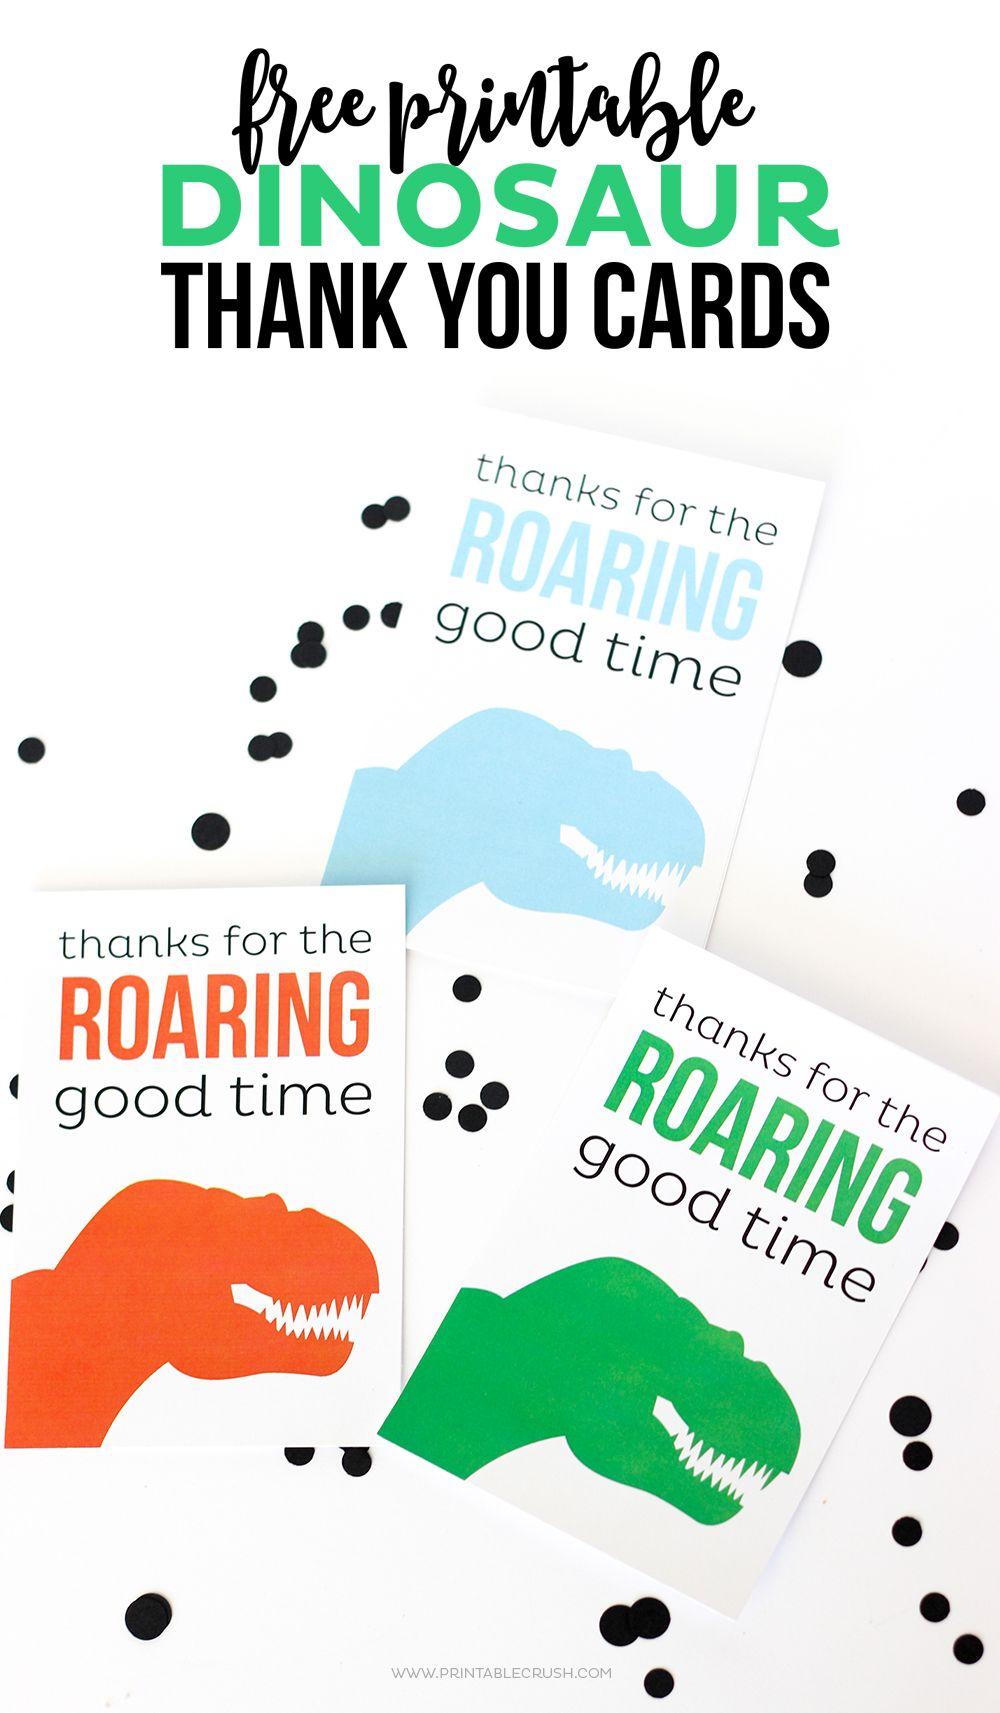 Printable Dinosaur Thank You Cards Free Thank You Cards From Kids Free Thank You Cards Dinosaur Birthday Party Invitations